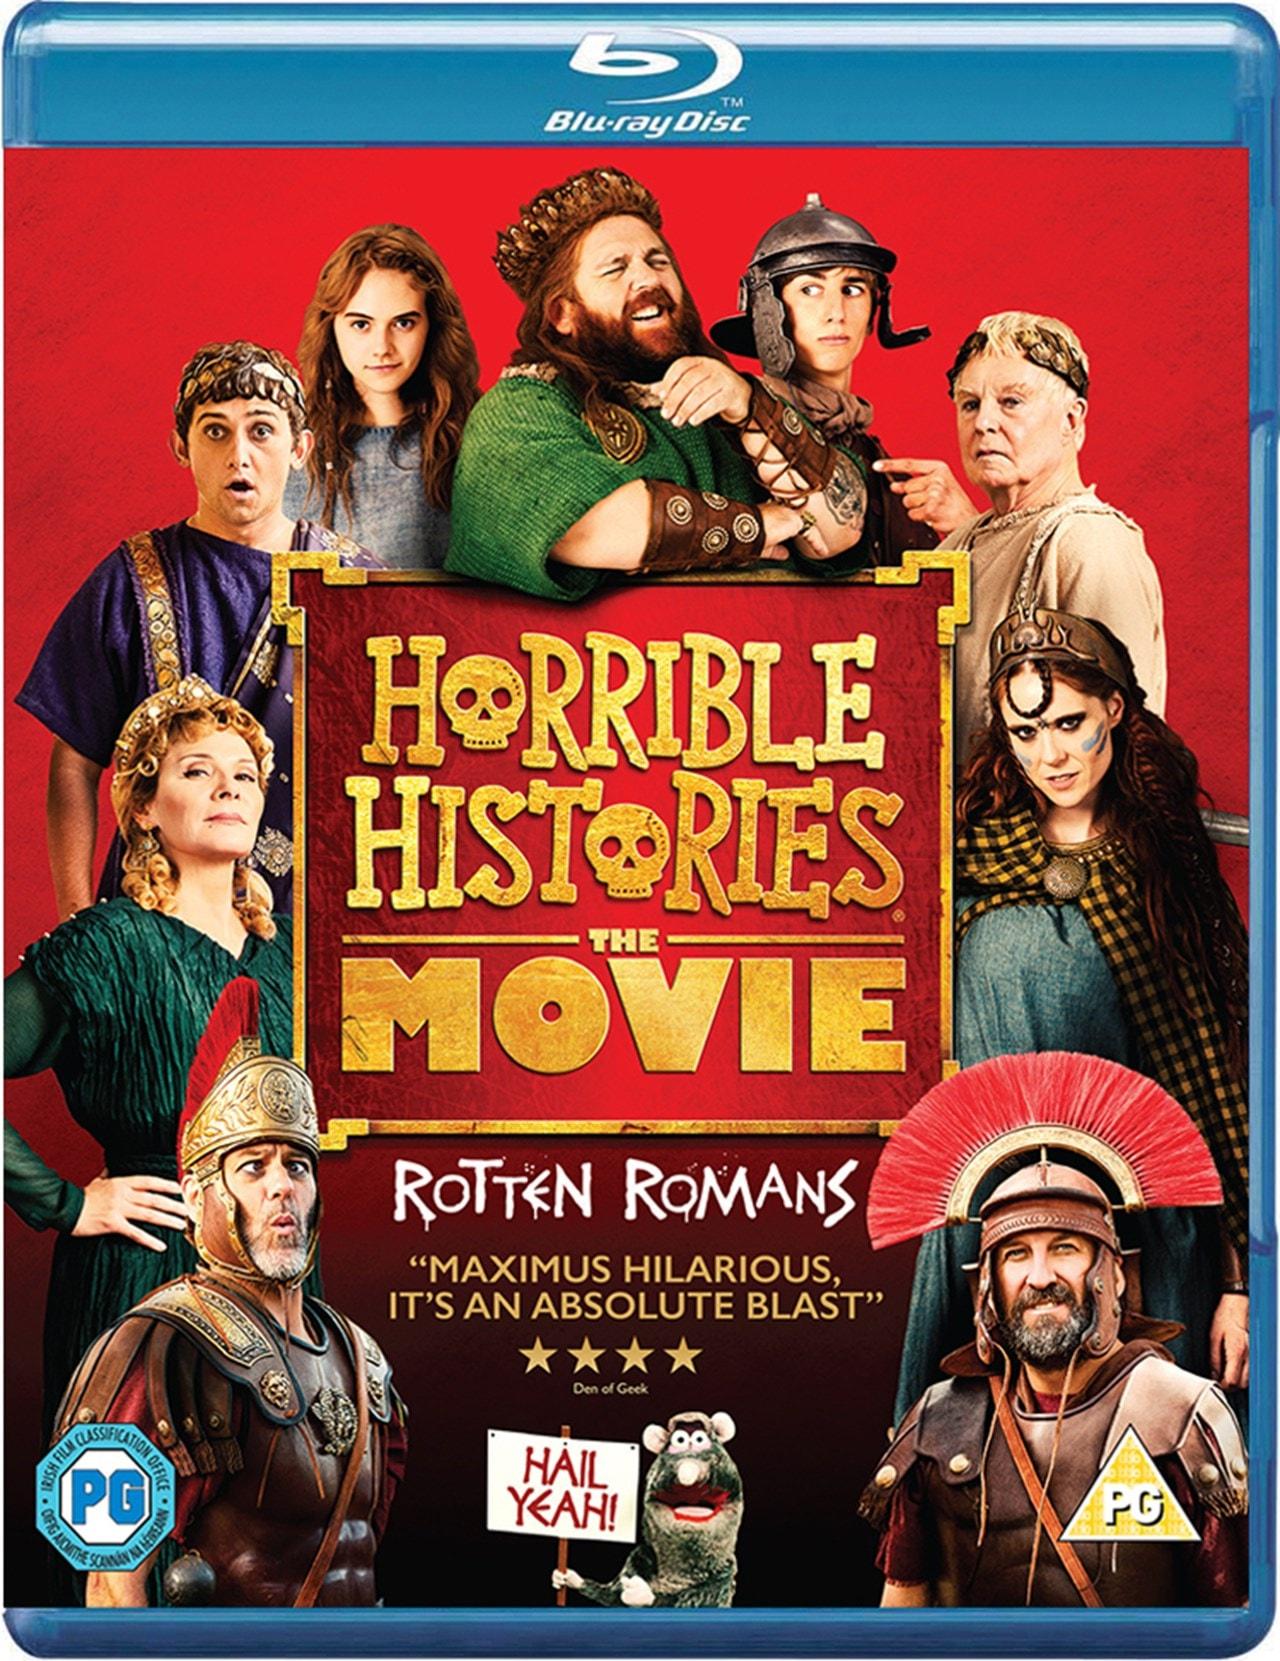 Horrible Histories the Movie - Rotten Romans - 1